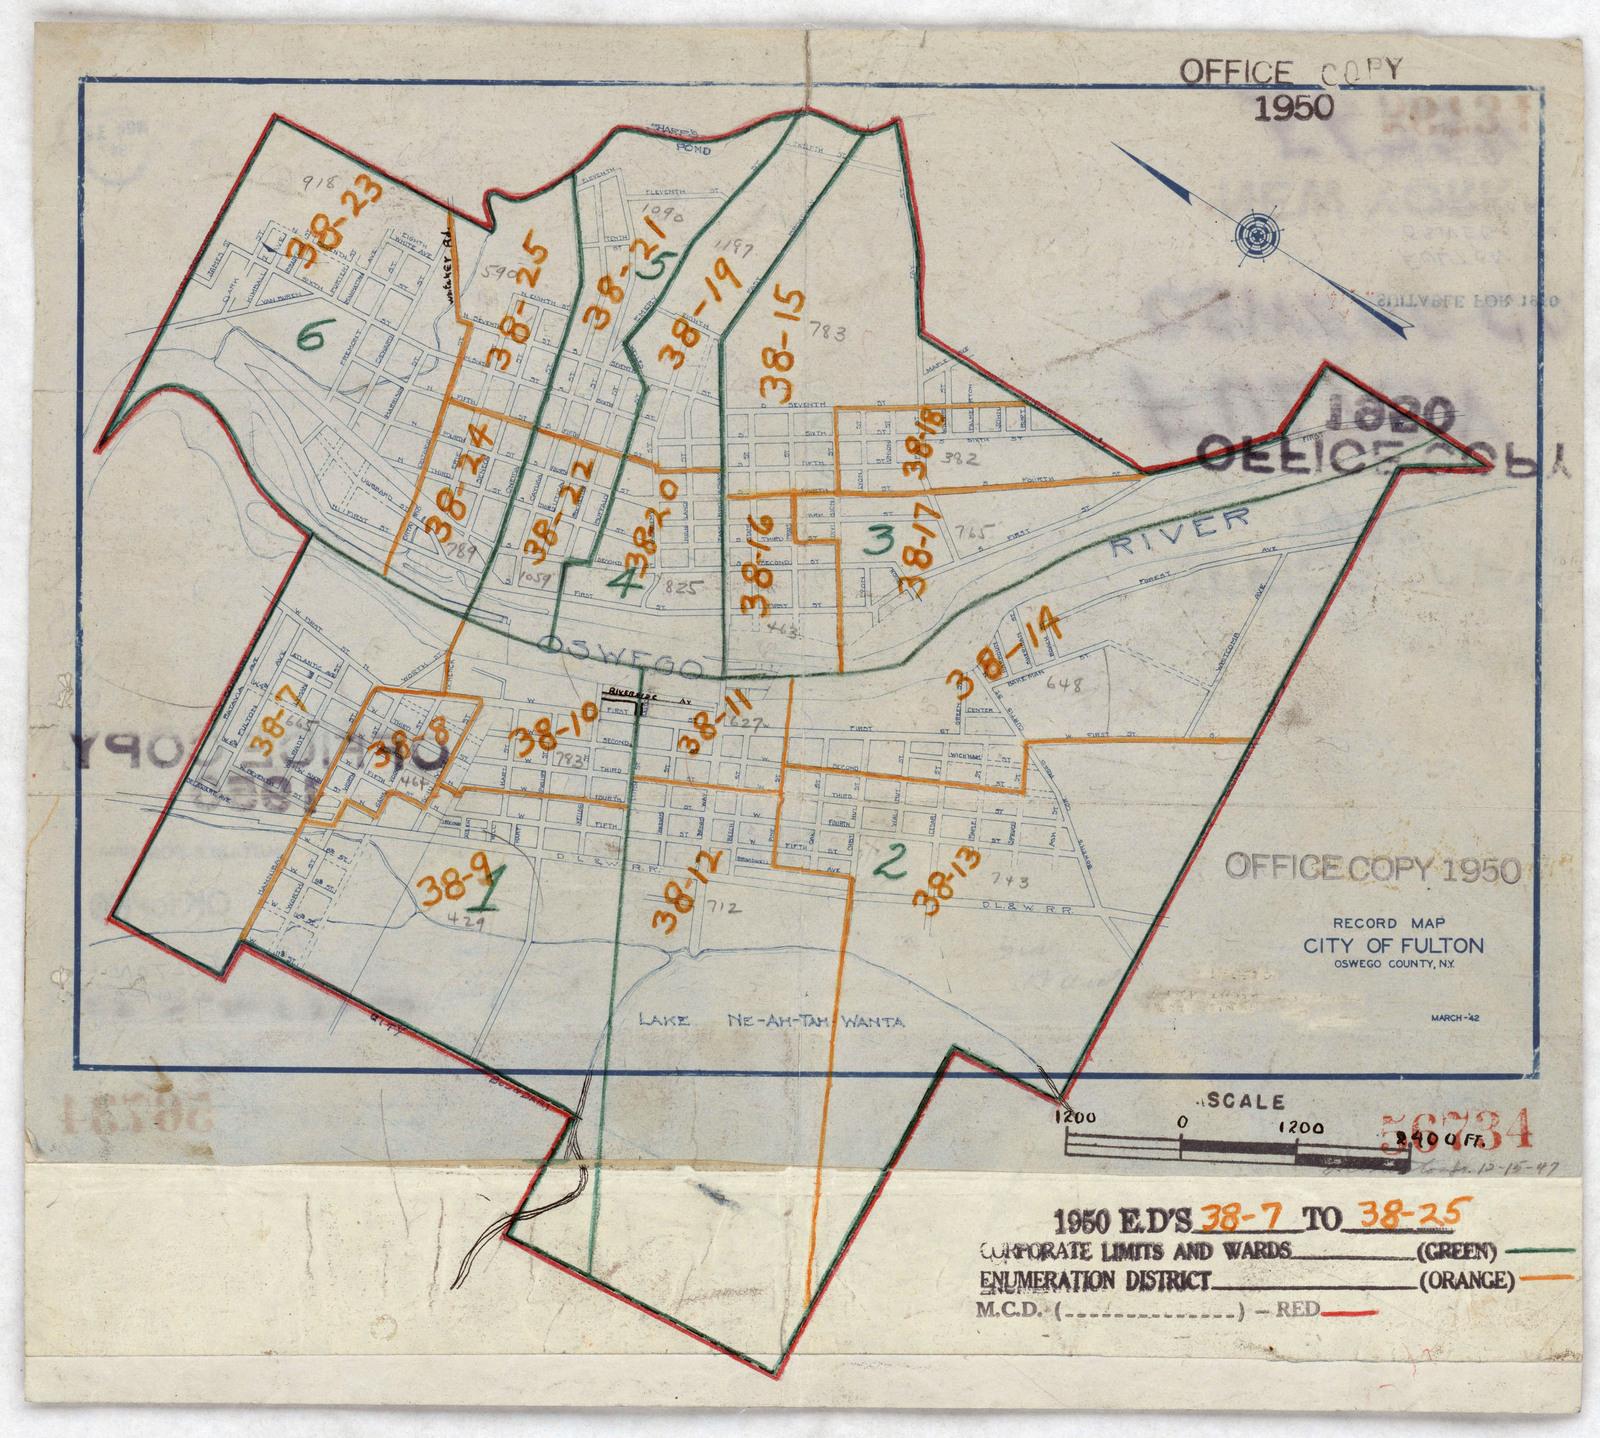 Map Of New York Oswego.1950 Census Enumeration District Maps New York Ny Oswego